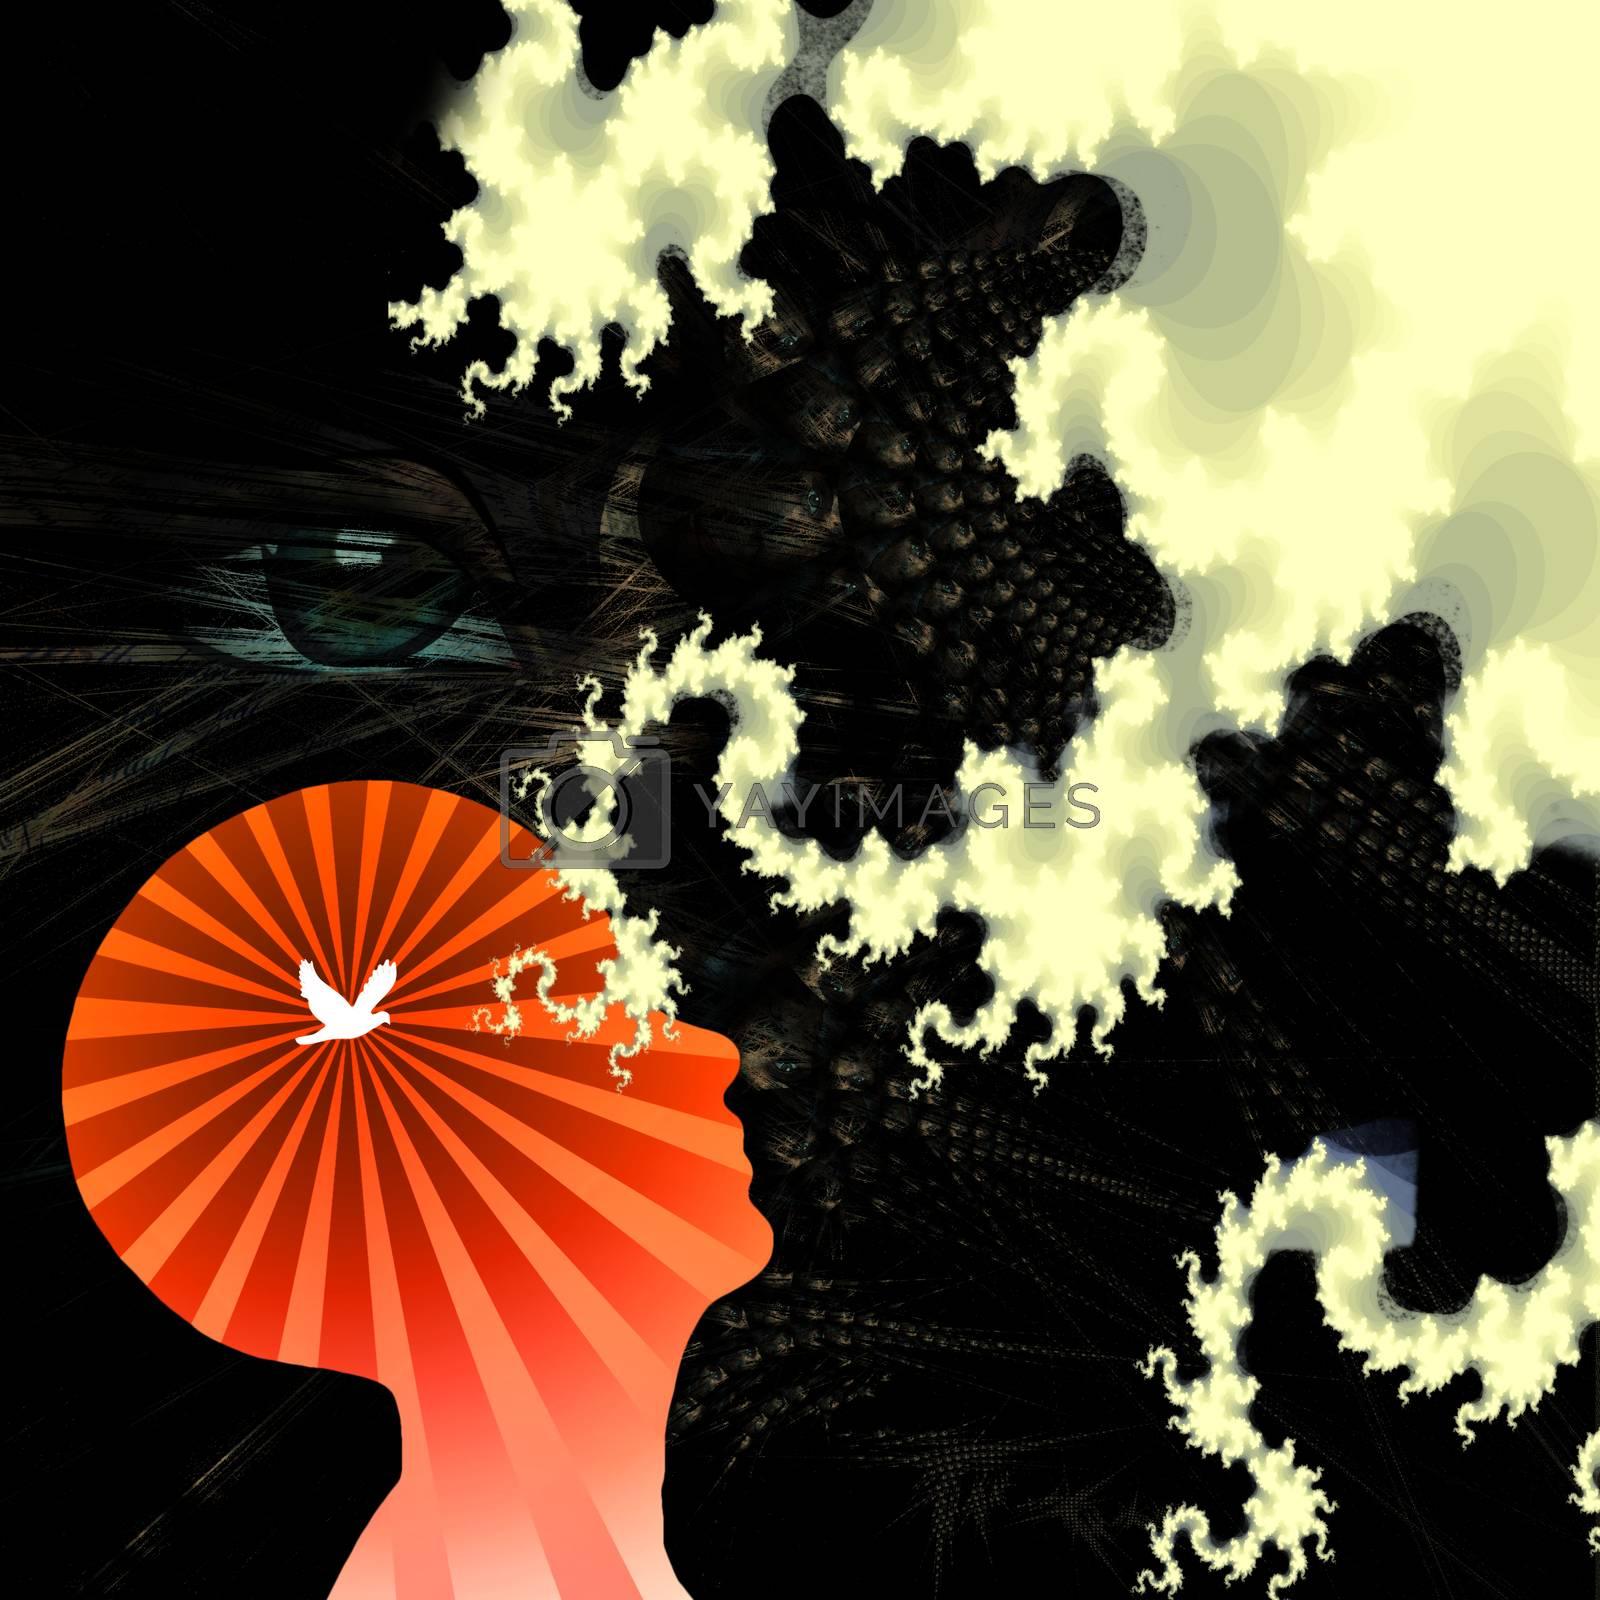 Mind by applesstock